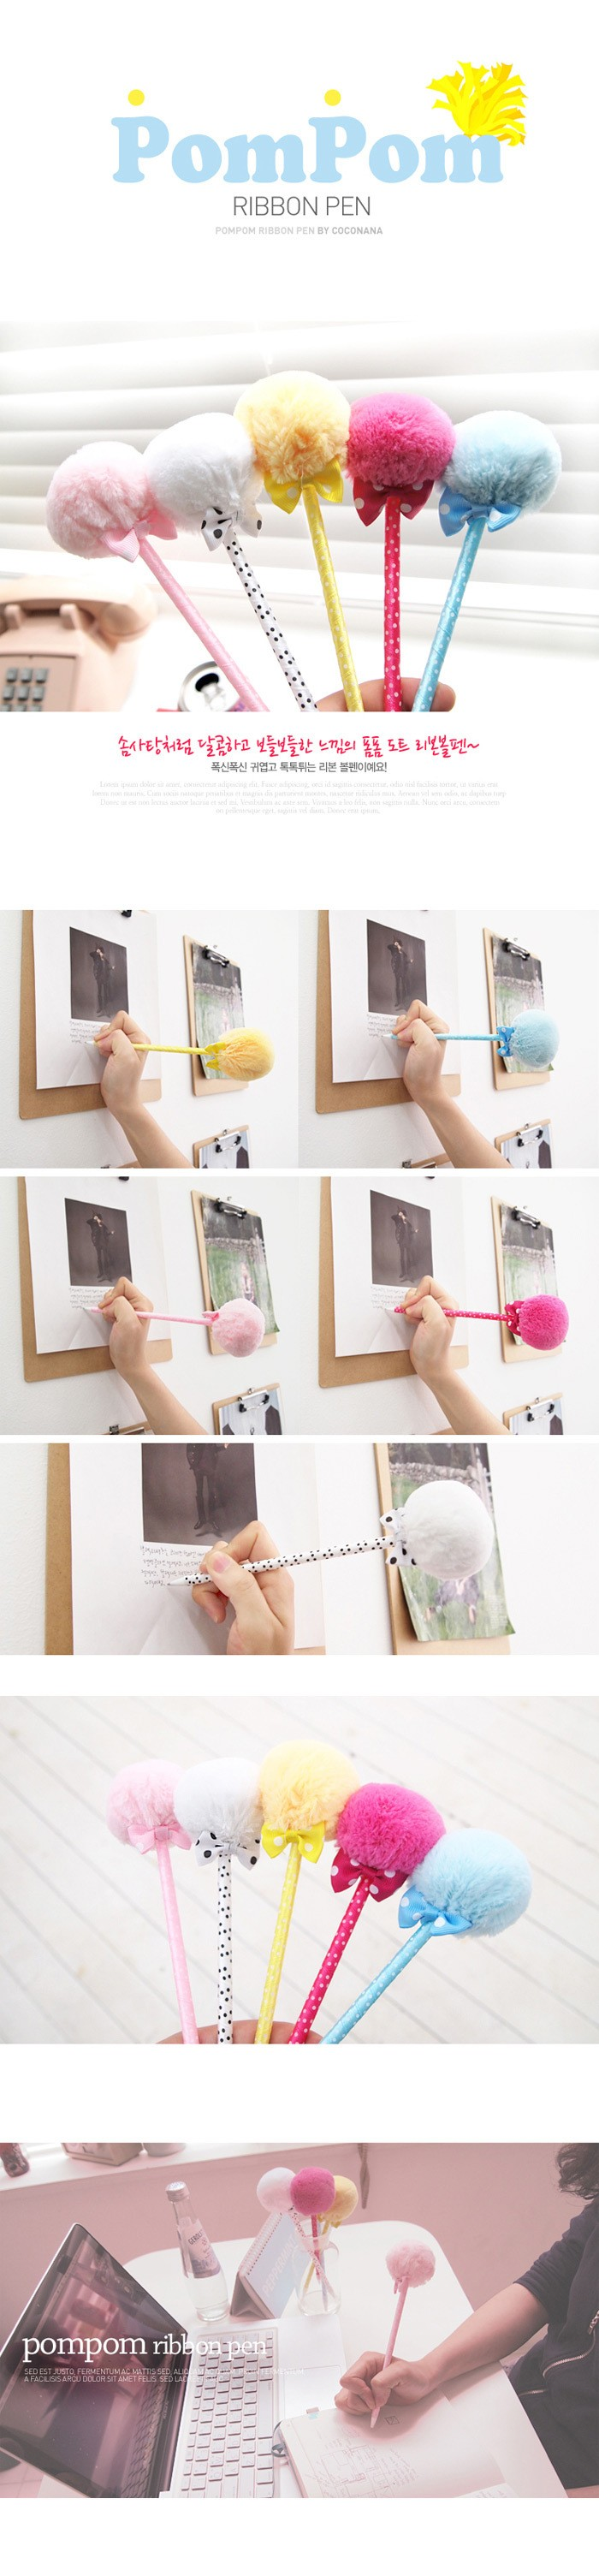 5 pcs/Lot Student Prizes Creative Promotional Pens, Balls Plush Ballpoint Pen, Cute Ball-Point Pens School Supplies B-005